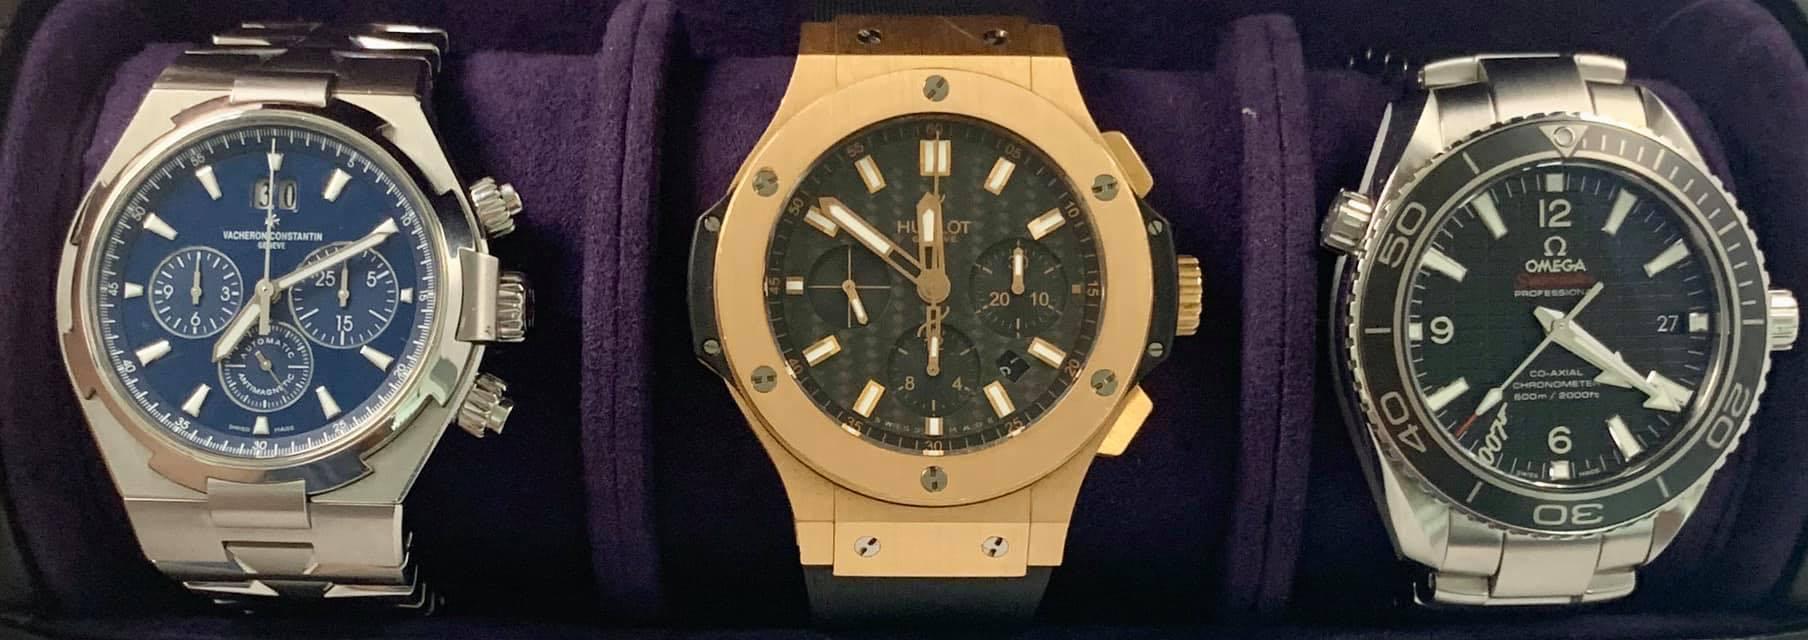 GJW Timepieces